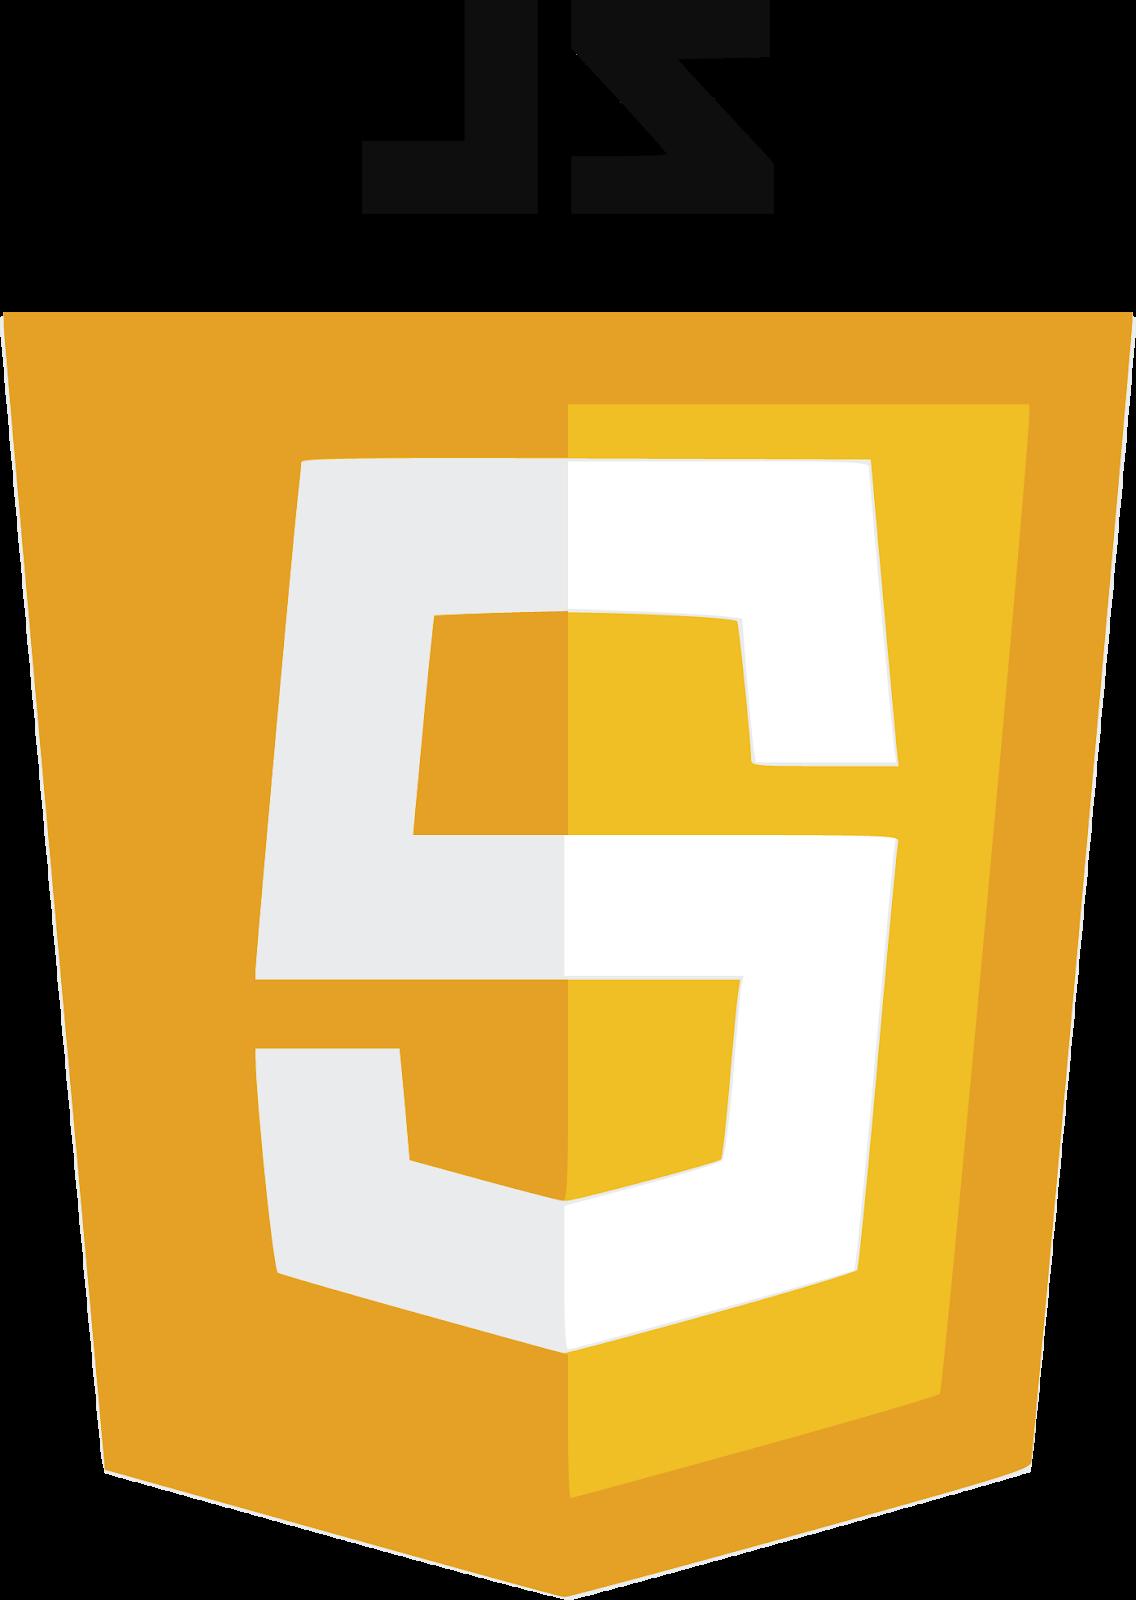 download logo javascript svg eps png psd ai vector color ...